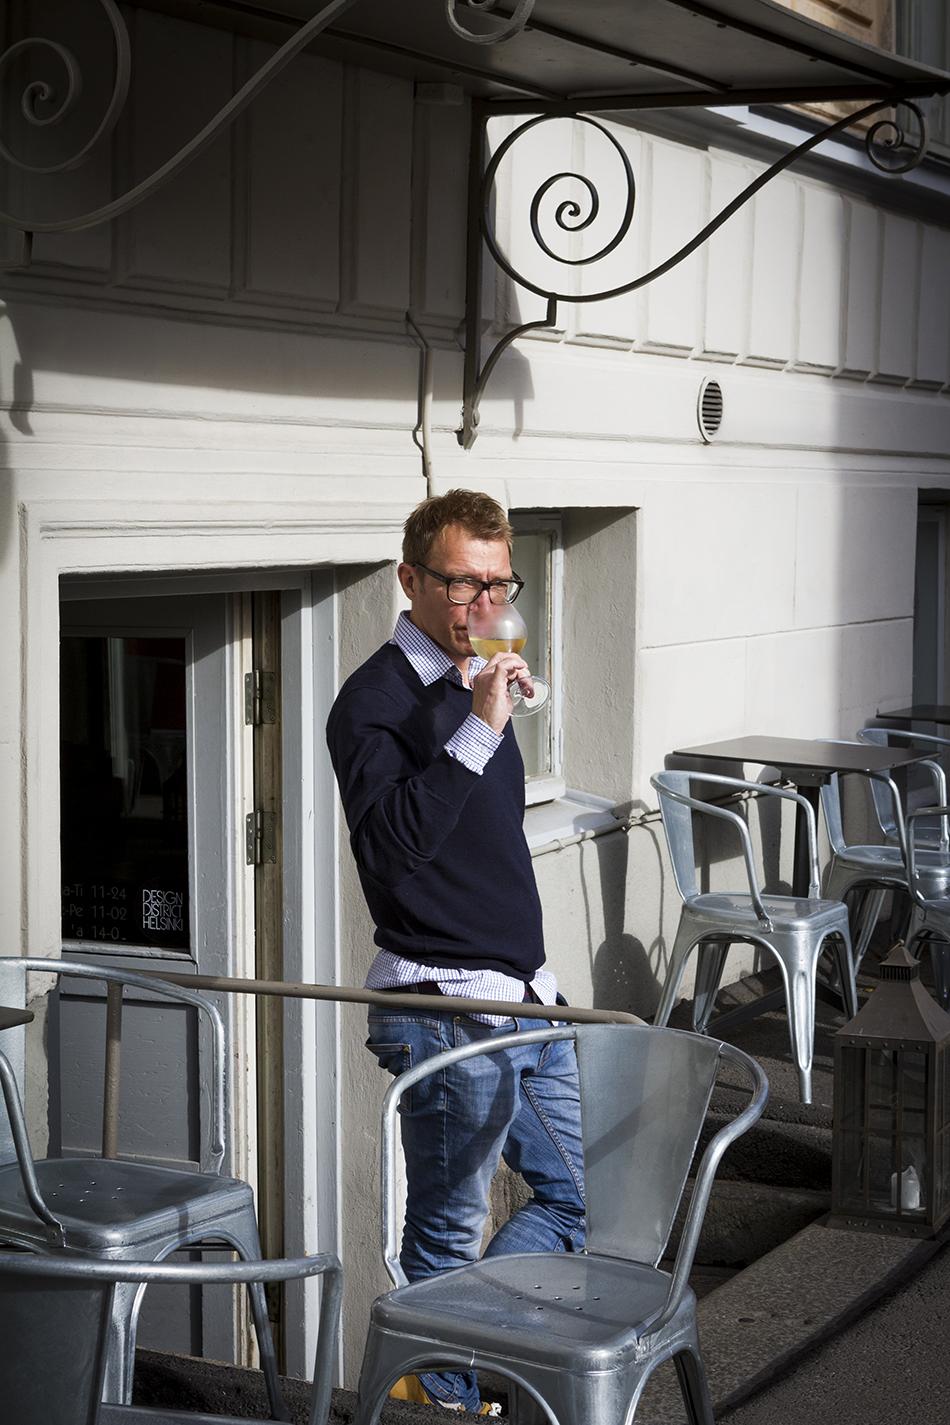 20_Plnty_Vinen_i_Helsinki_foto_Riitta_Sourrander_2015